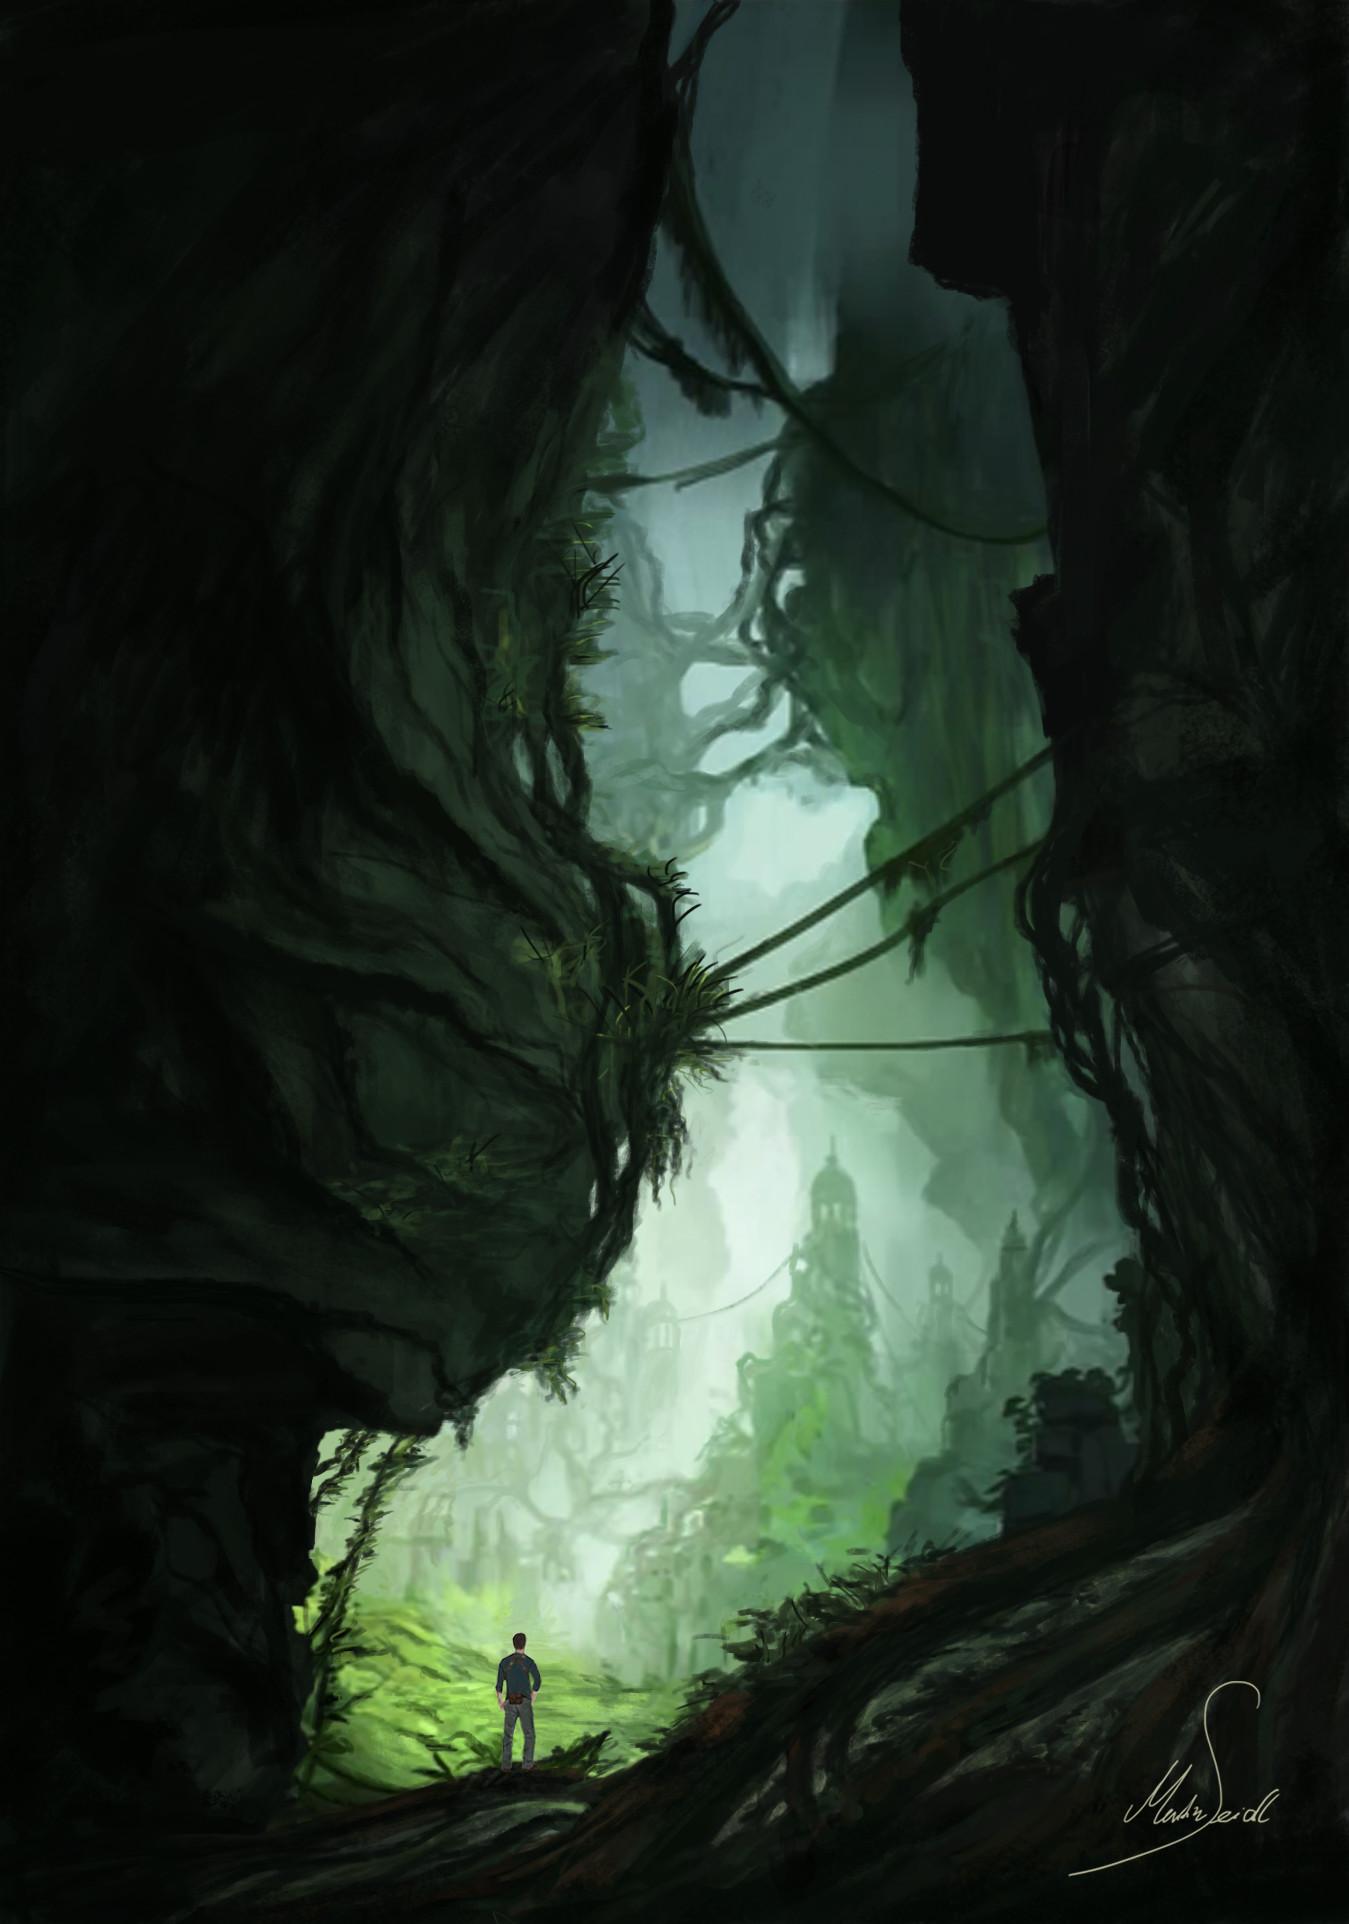 Martin seidl uncharted jungle concept art